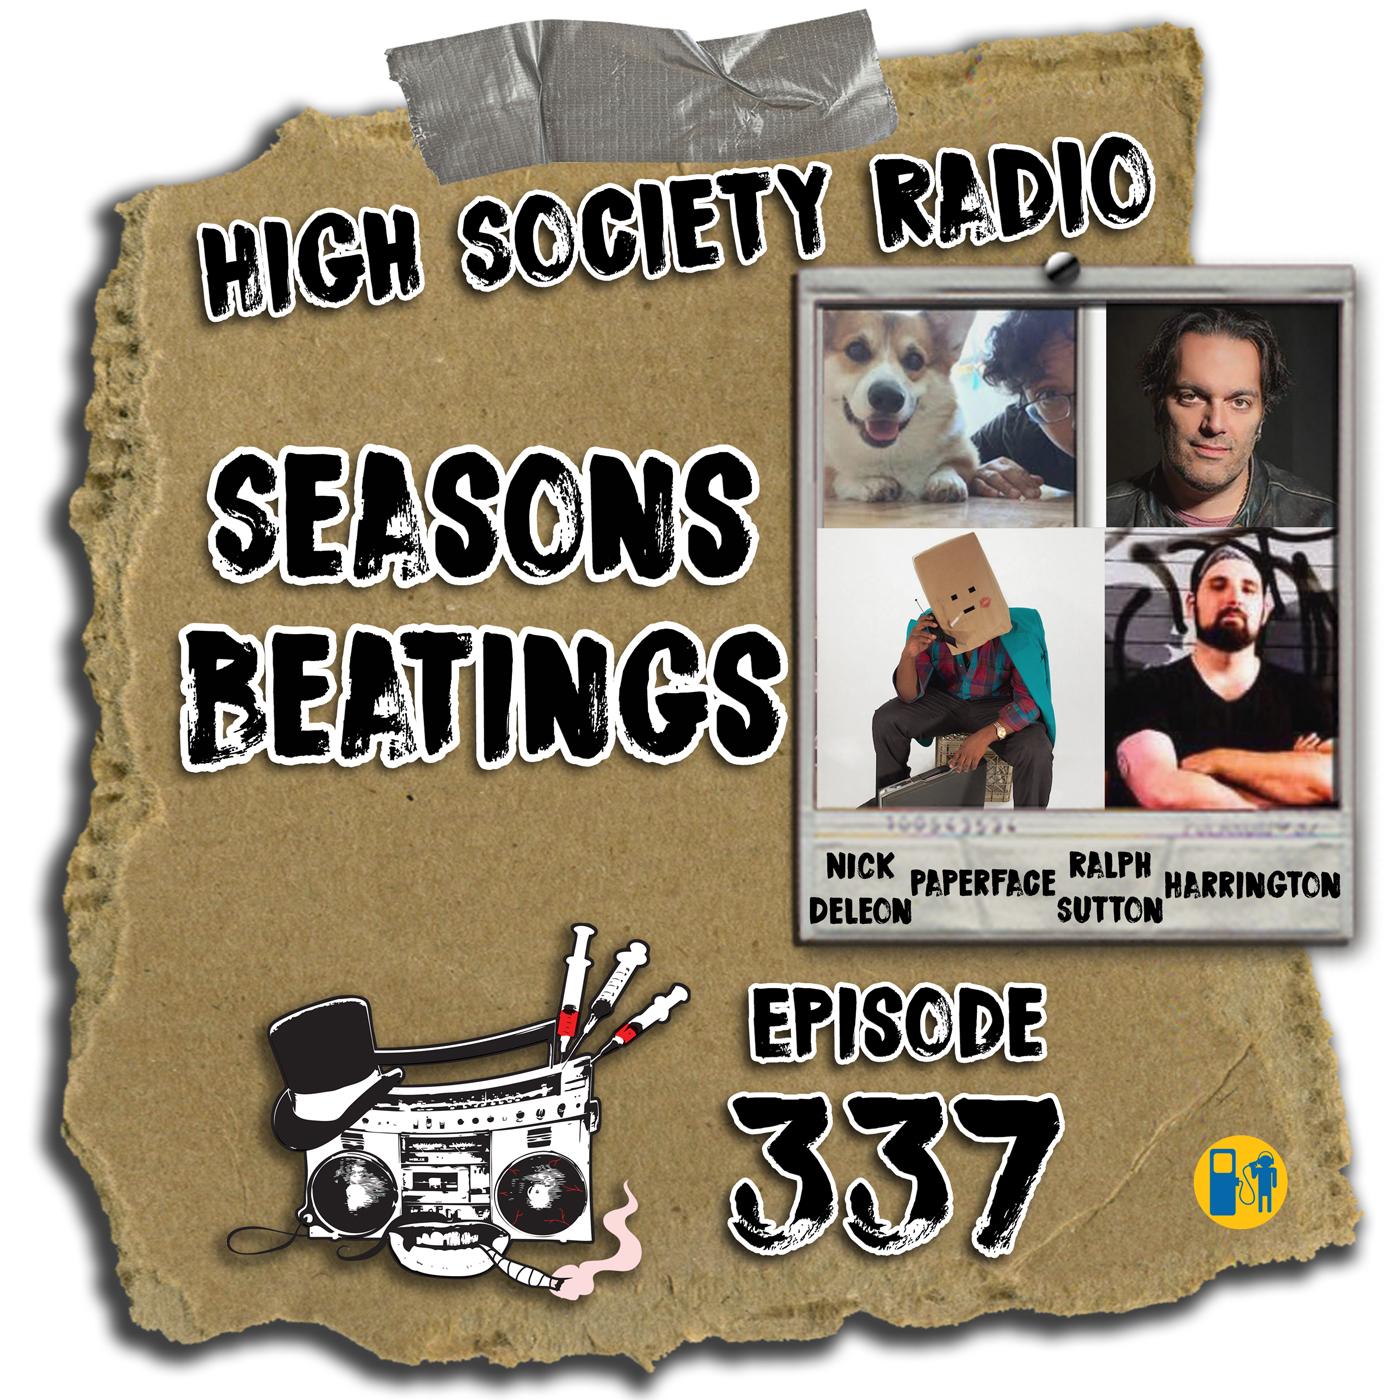 HSR 12/20/18 Seasons Beatings (Paperface, Nick De Leon, Ralph Sutton, Mike Harrington)